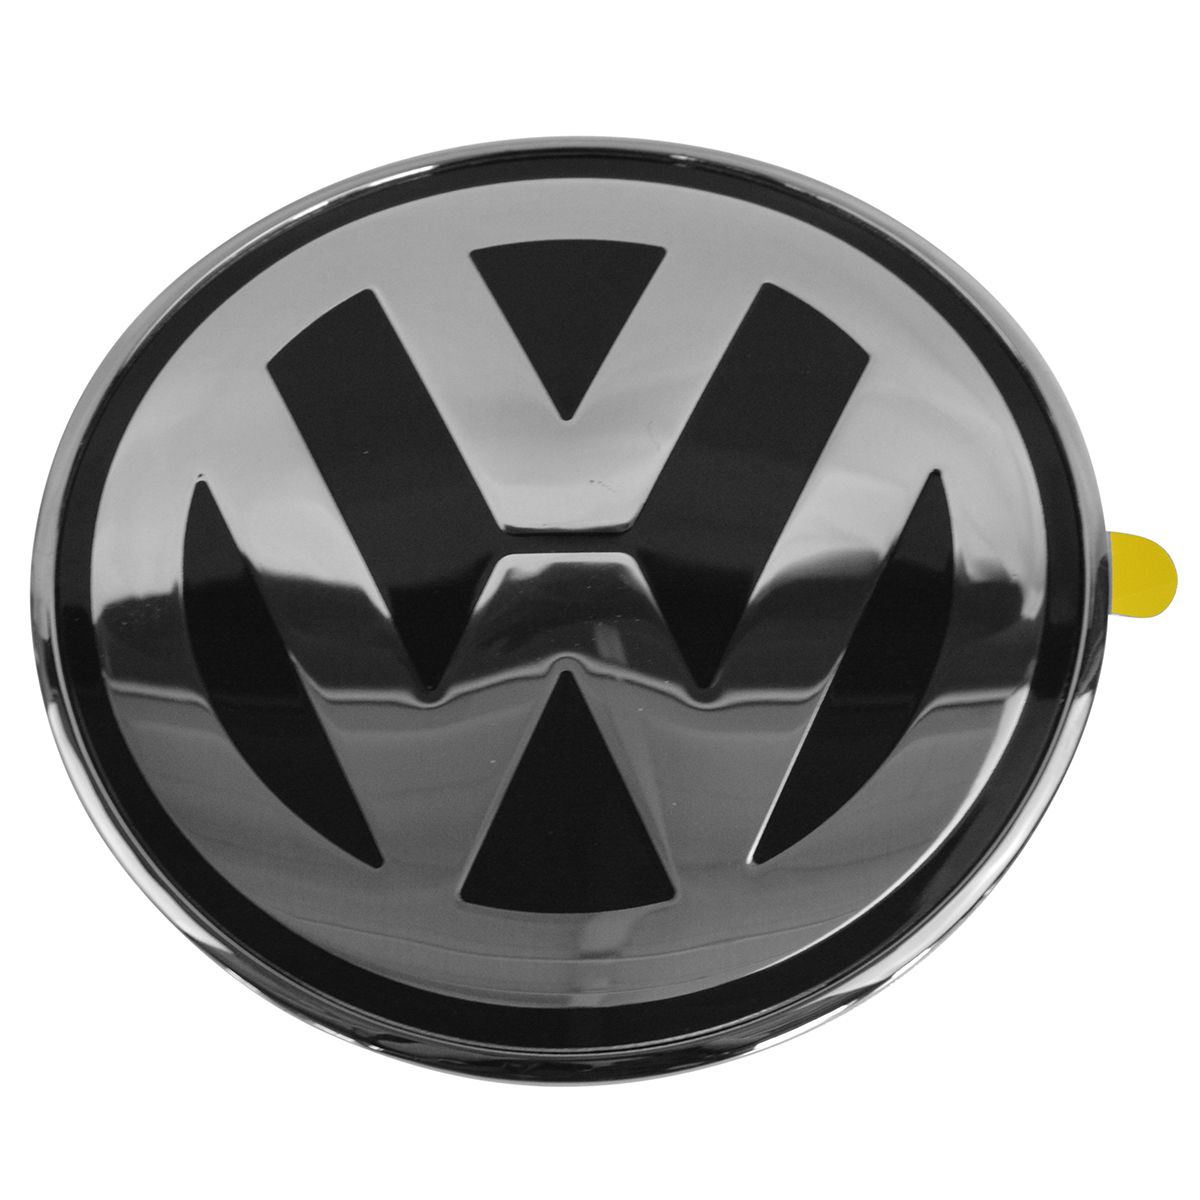 For VW new Beetle 02-05 Hood Emblem badge Chrome-Grey front engine lid insignia